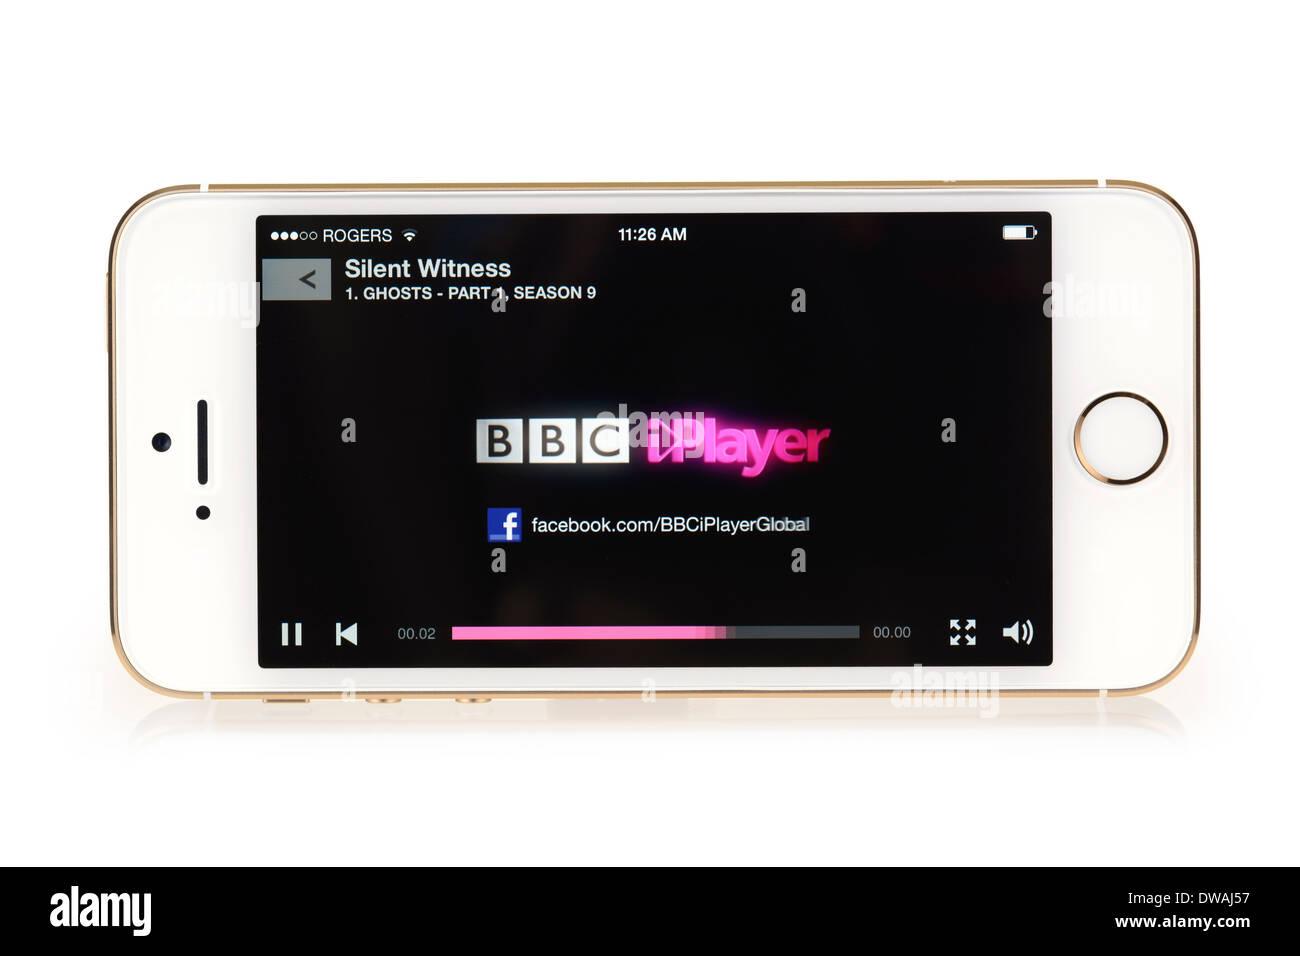 BBC iPlayer Logo  Splash screen, iPhone 5S starting to stream TV show Silent Witness, App running on iPhone 5 S - Stock Image